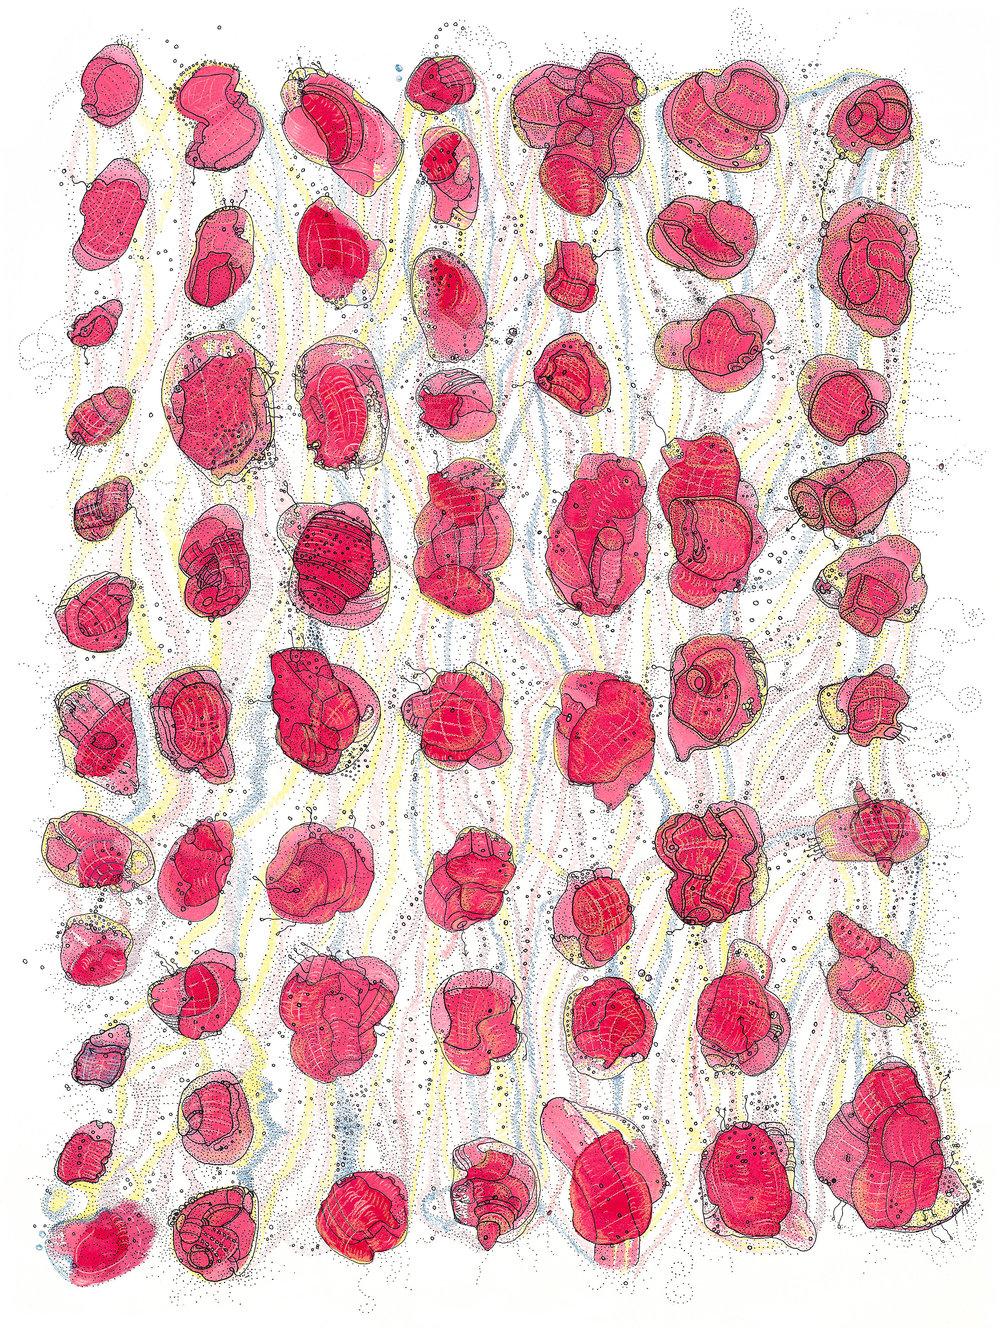 RogelioMaxwell-IntercellularPathwaysAndAdaptationResistance-2010-Ink_AcrylicPaint-18x24-$5000.jpg